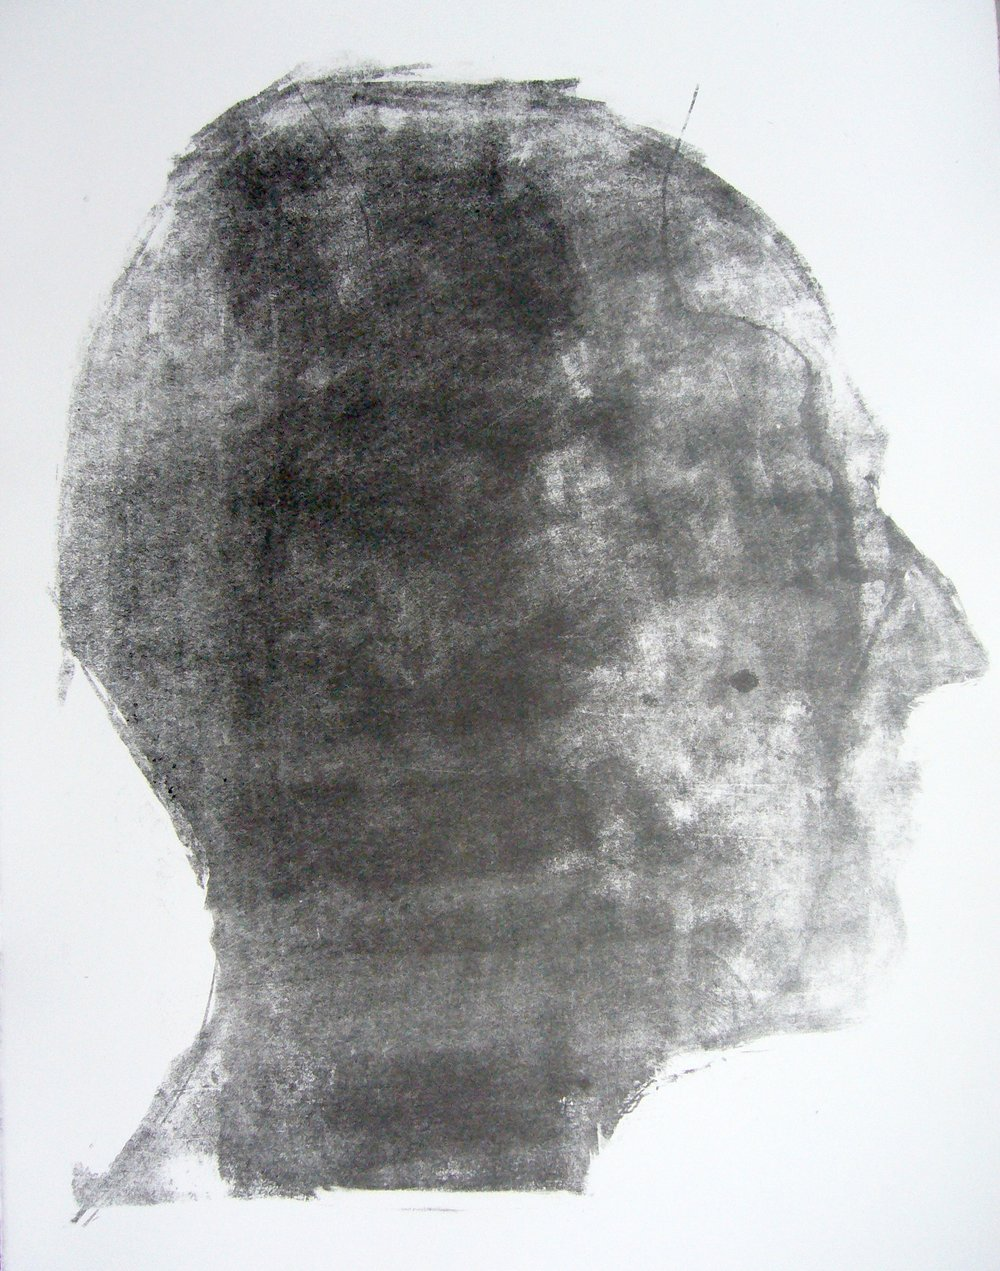 Kopf XI, e.e., 2014, 59 cm x 42 cm.JPG